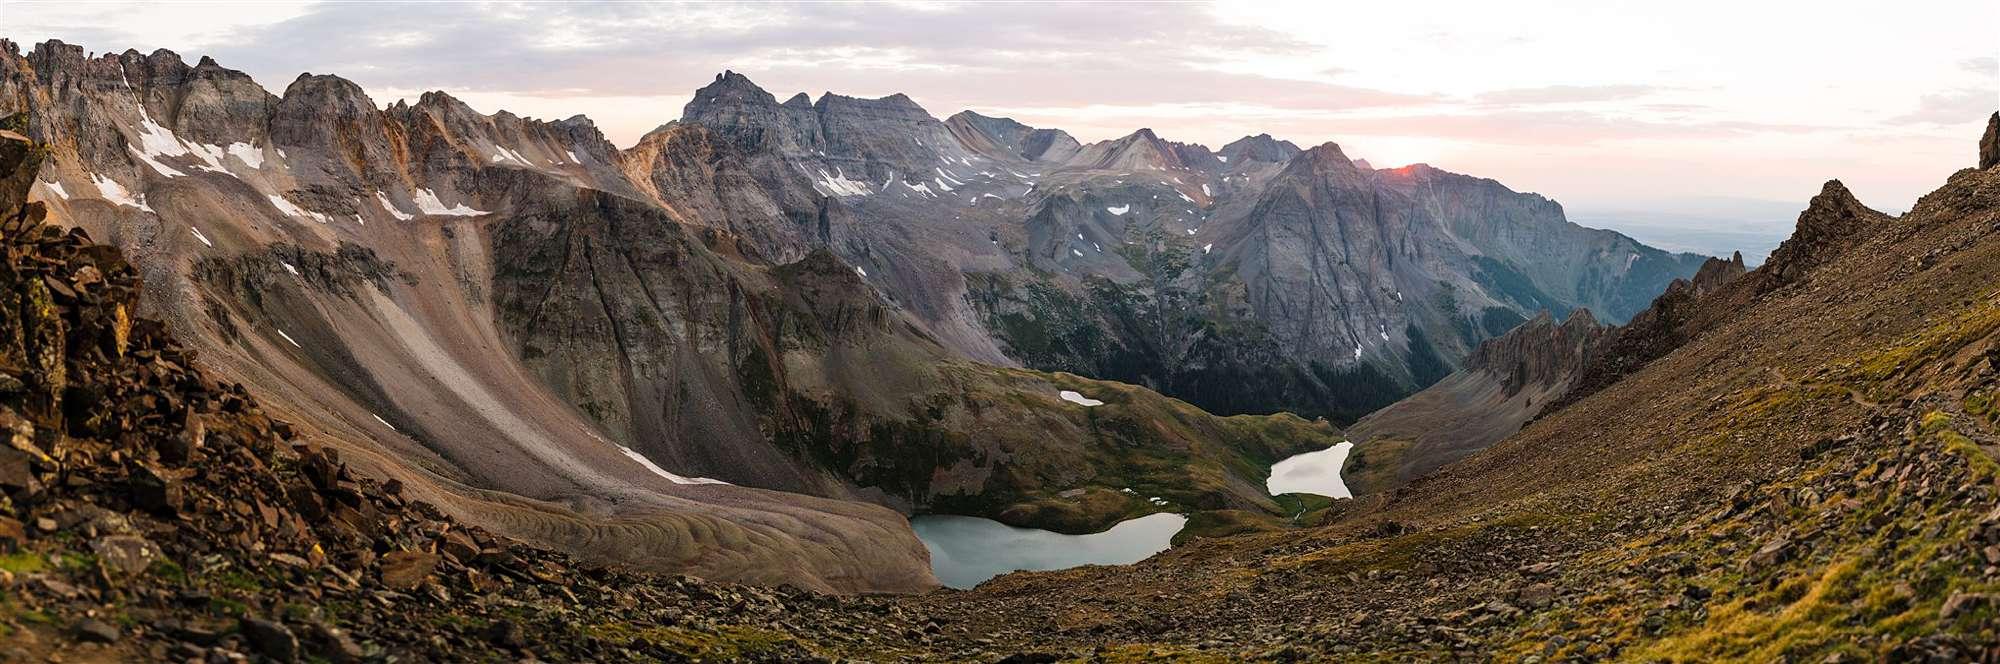 Colorado_Jeeping_Elopement_Emily_Matt_The_Foxes_Photography_0048.jpg